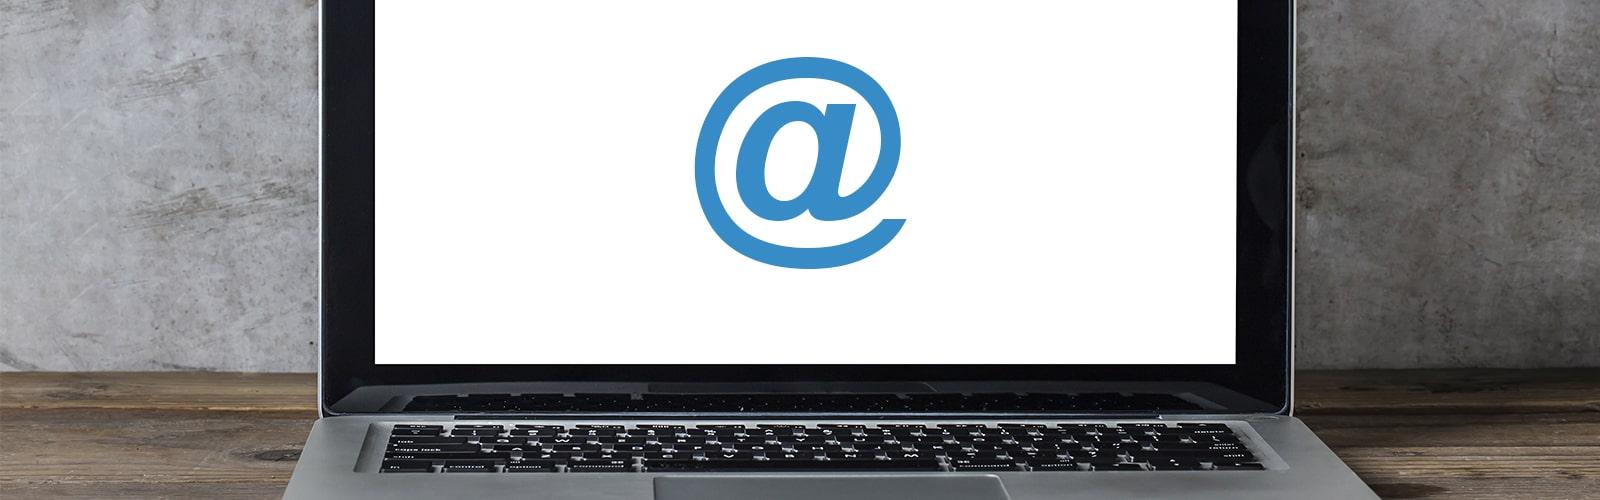 Comment réussir une campagne d'email marketing?